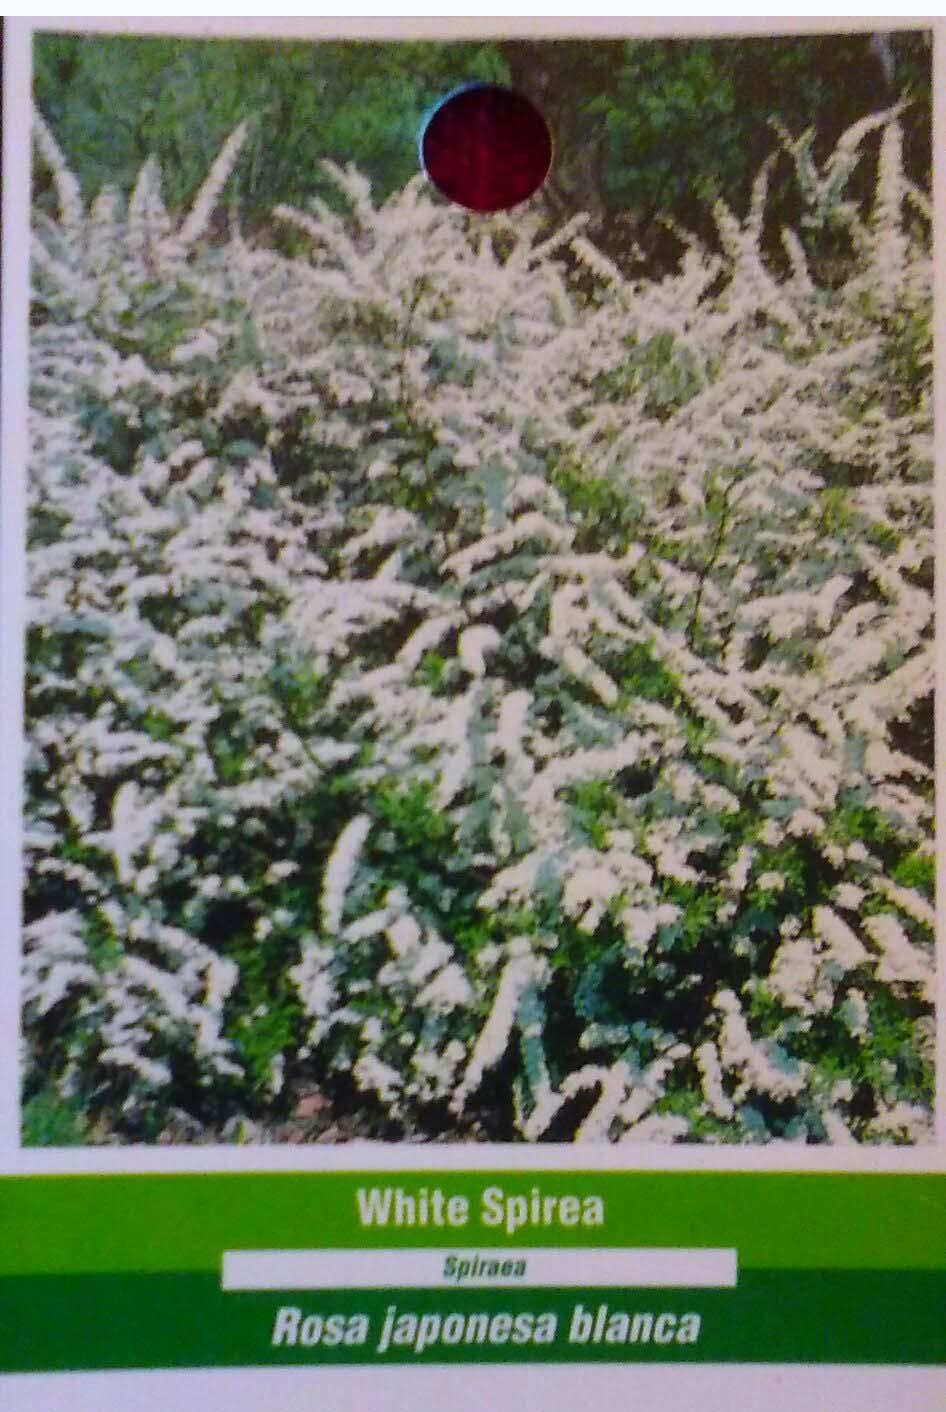 White Spirea Flower Hedge Bush Flowers Blooms Plant Easy Grow Live ...